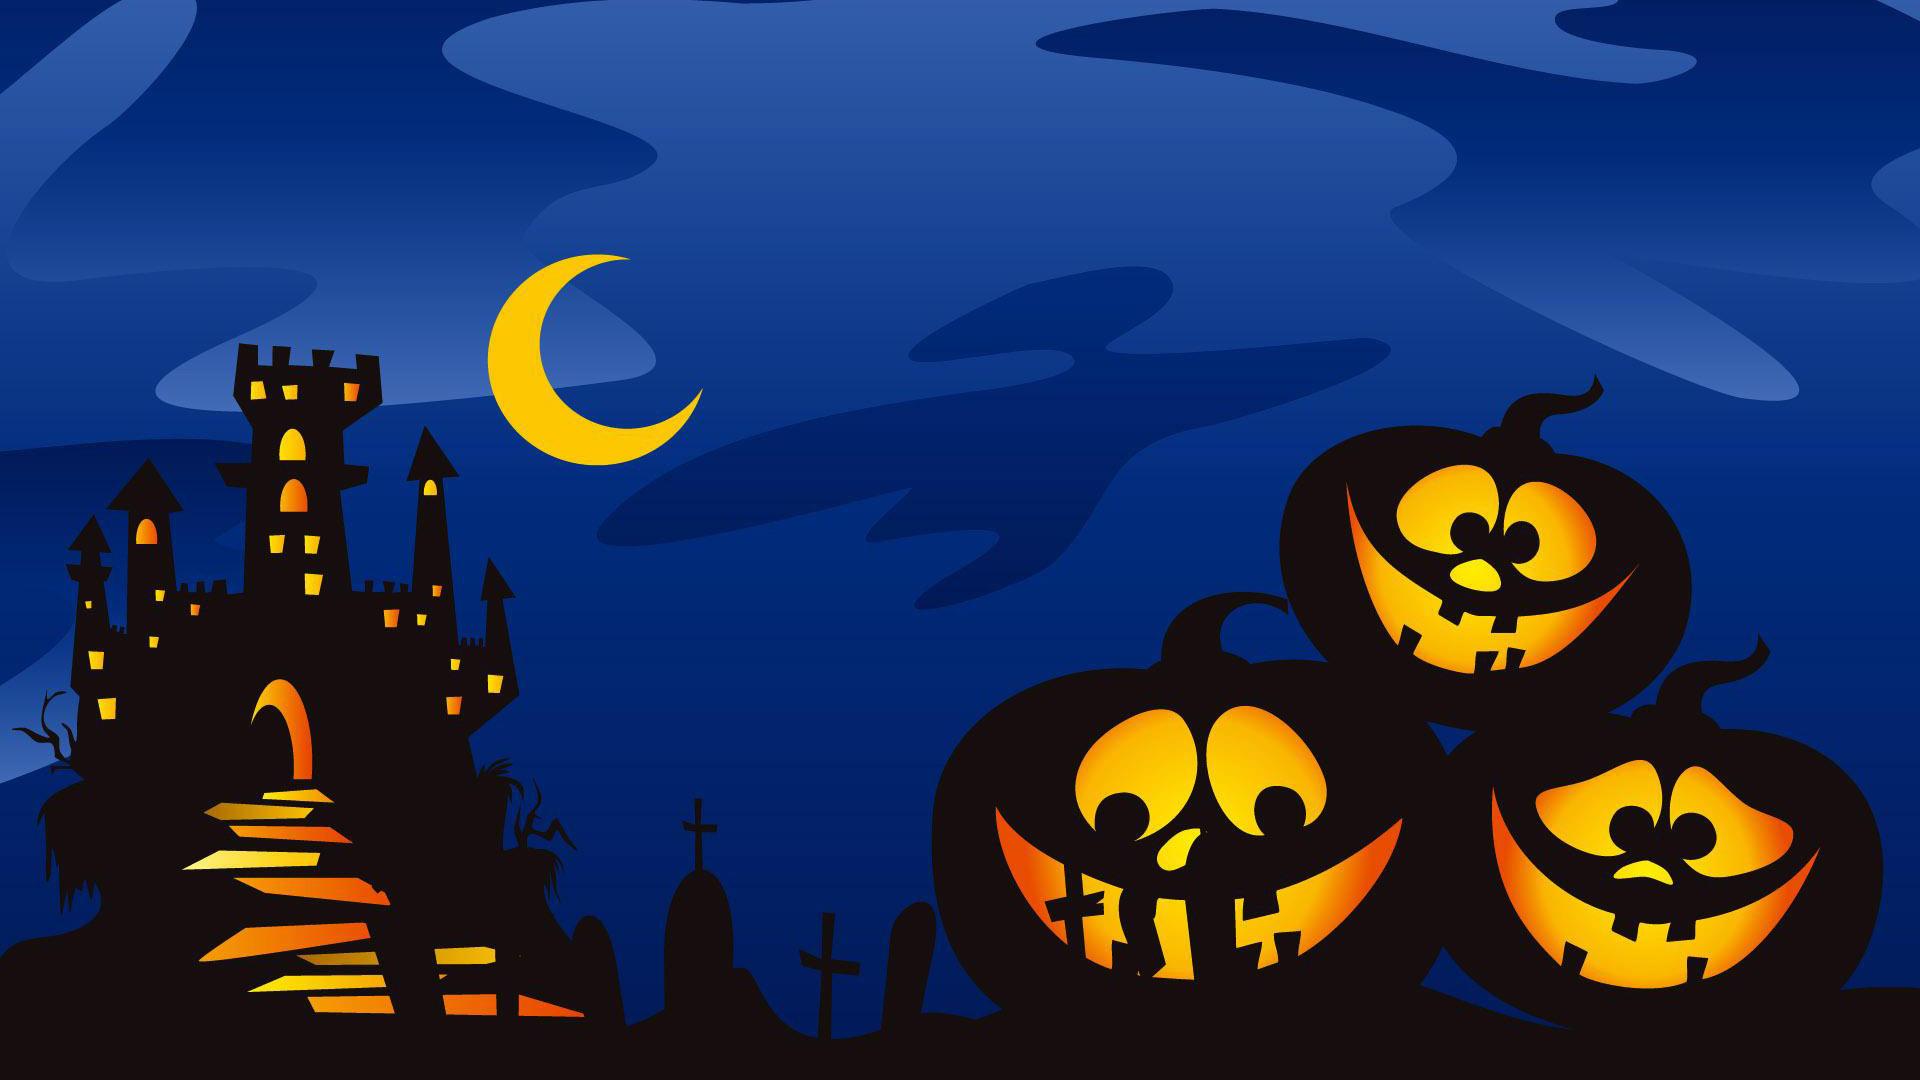 halloween funnies | Funny Halloween Pictures – Dracula – Vampire | MY JTV  WISH LIST | Pinterest | Funny halloween pictures, Halloween pictures and  Funny …